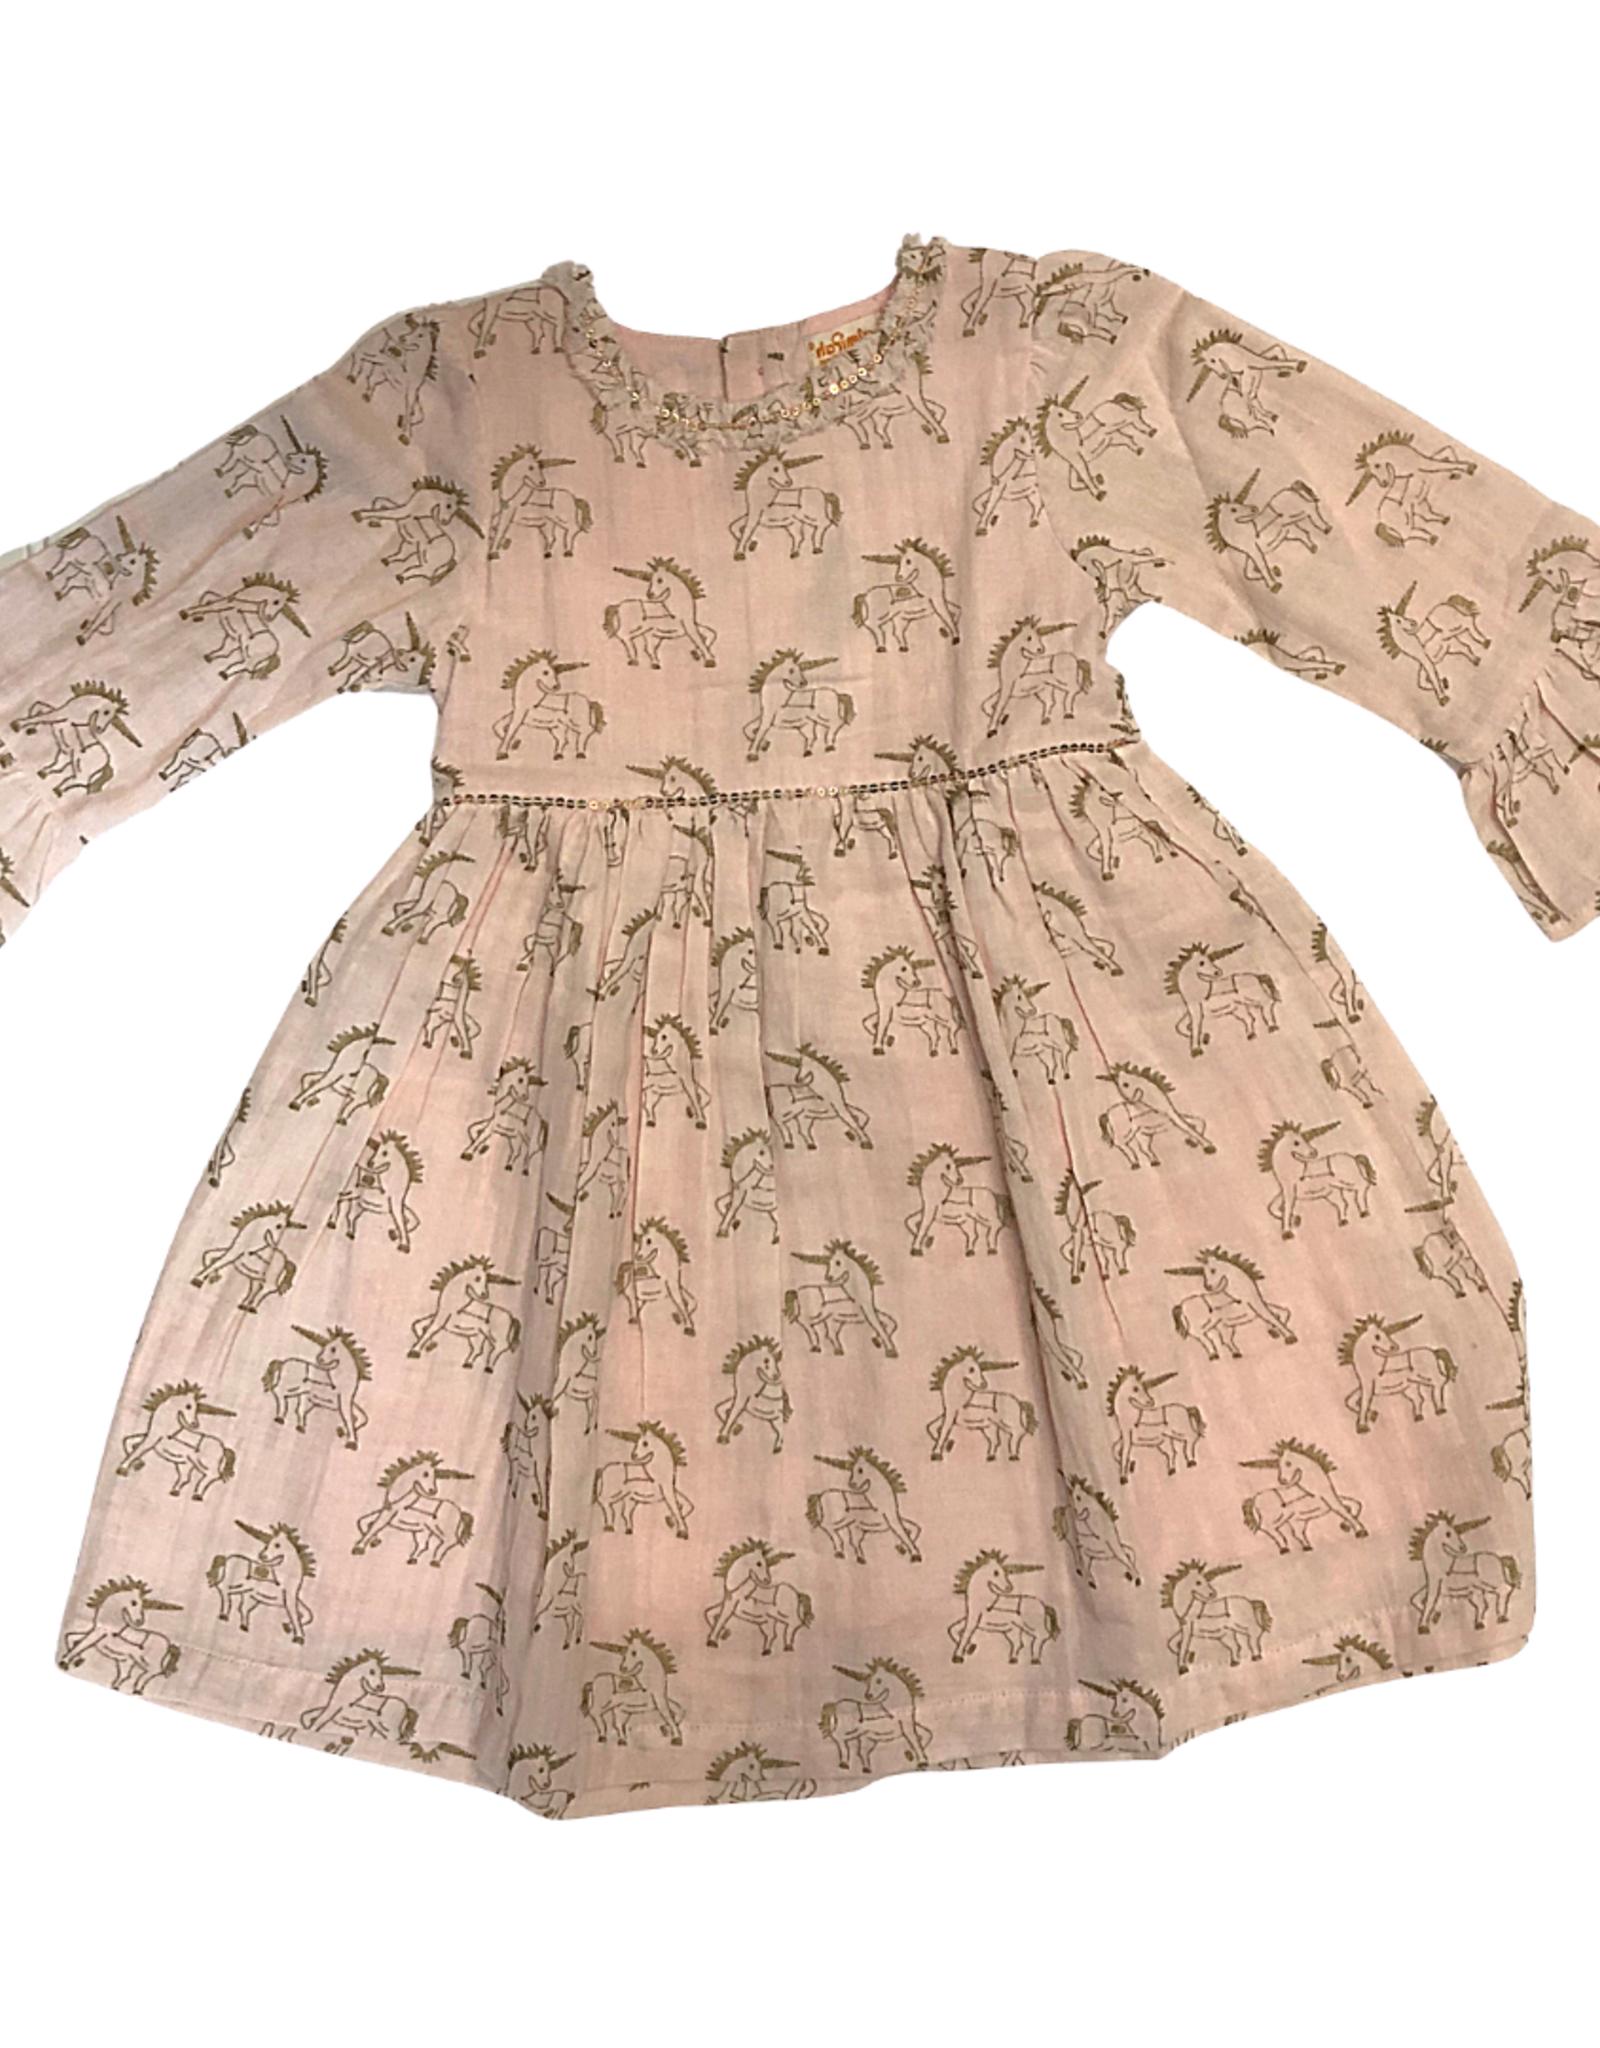 Almirah Almirah Gia Dress, Unicorn